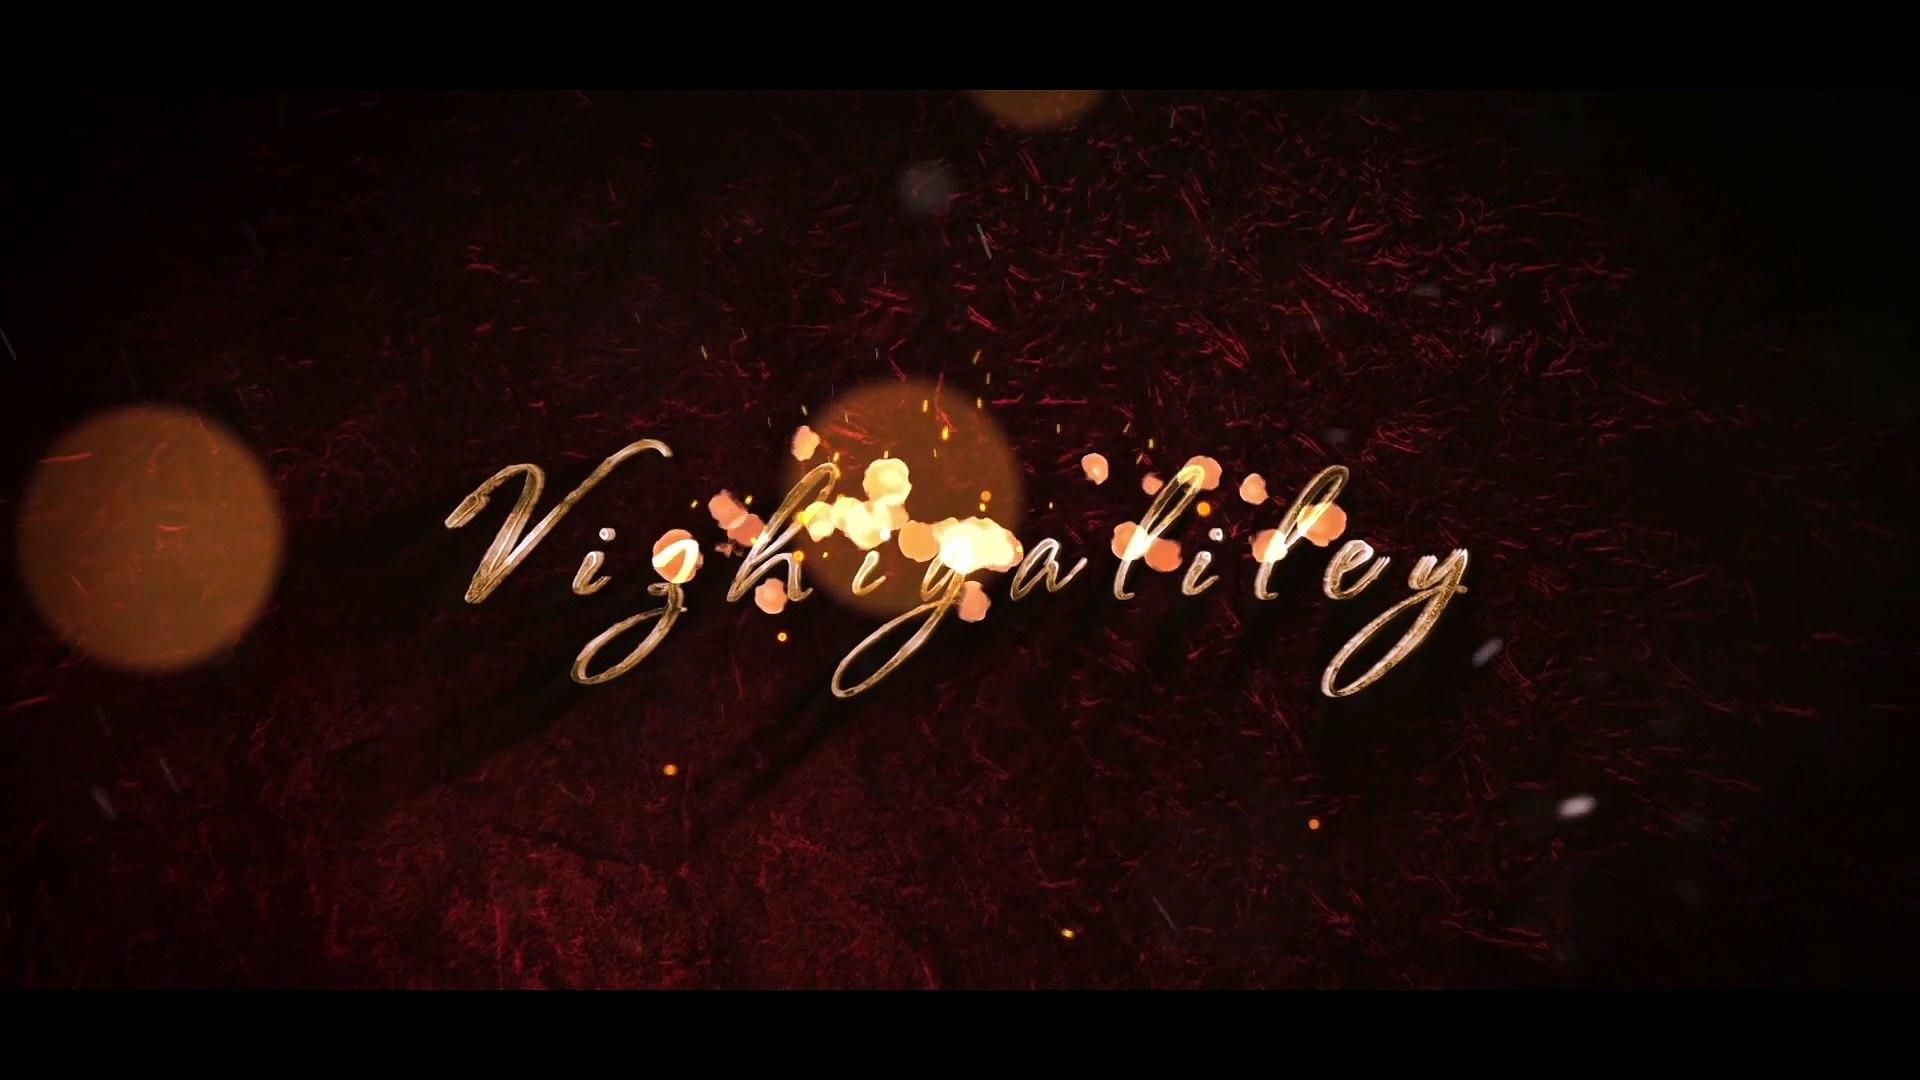 Vizhigaliley | Tamil Love Song | Arun Rajendren | Semma Bass | Murugavel Balusamy